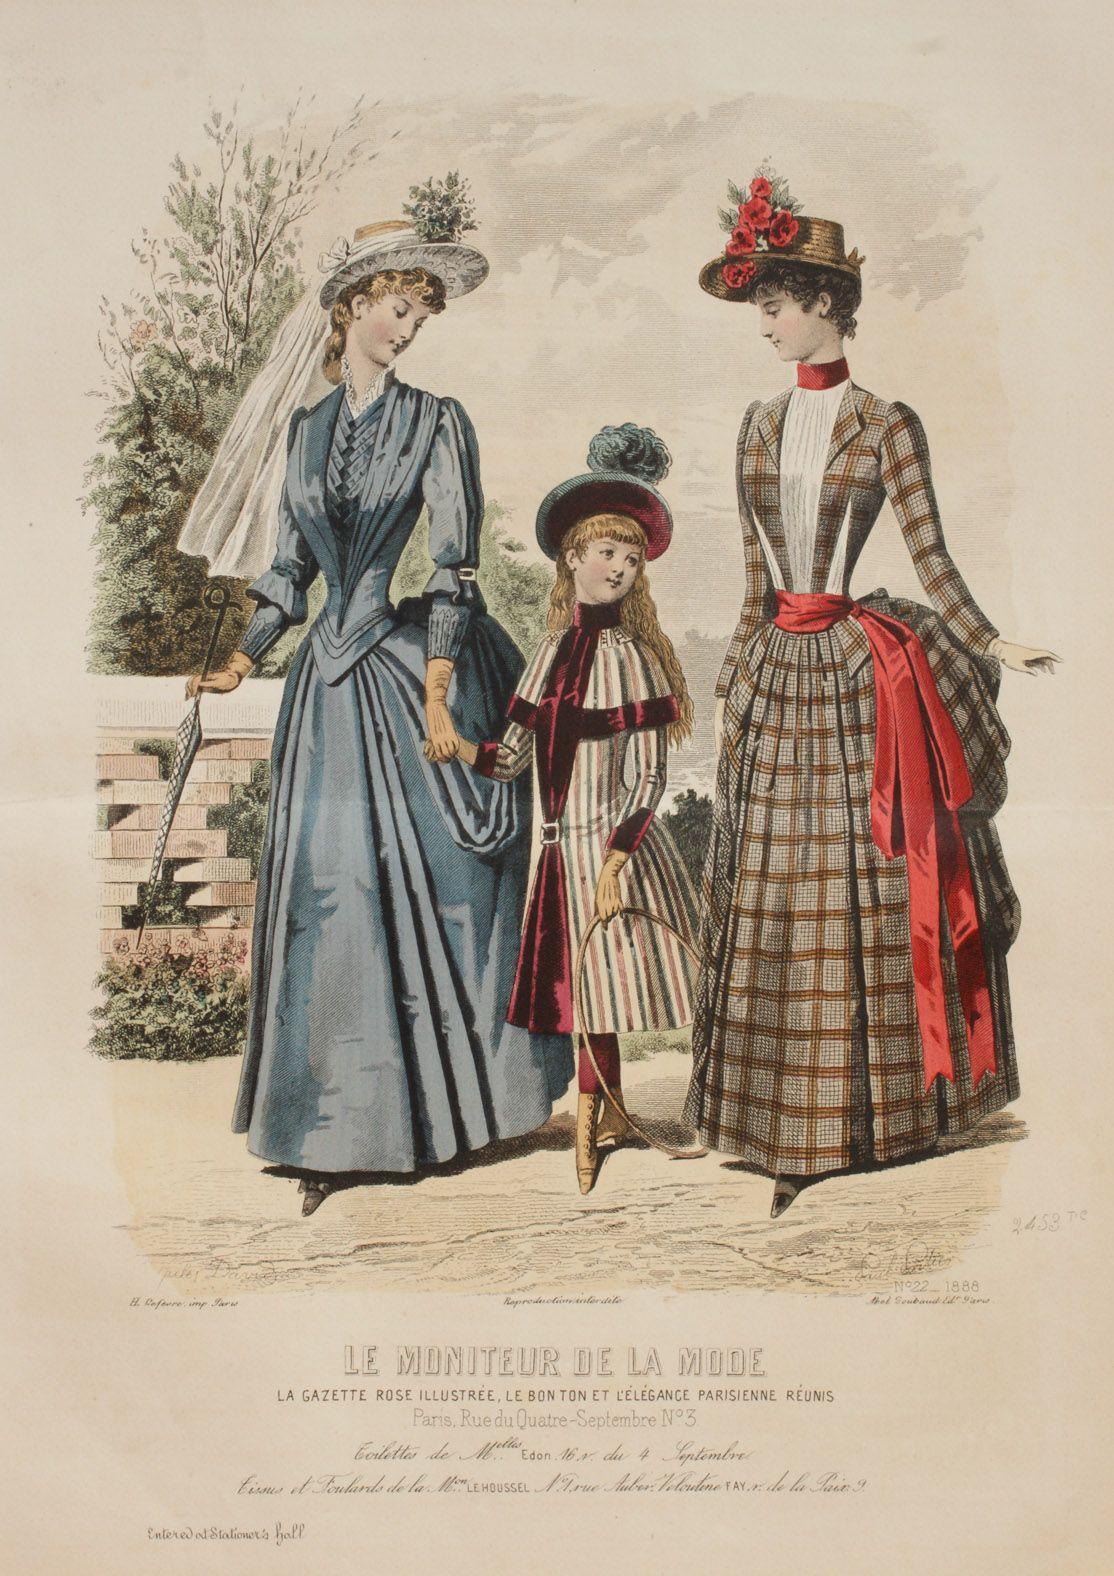 le moniteur de la mode 1888 bilder kunst malerei pinterest modezeichnungen. Black Bedroom Furniture Sets. Home Design Ideas